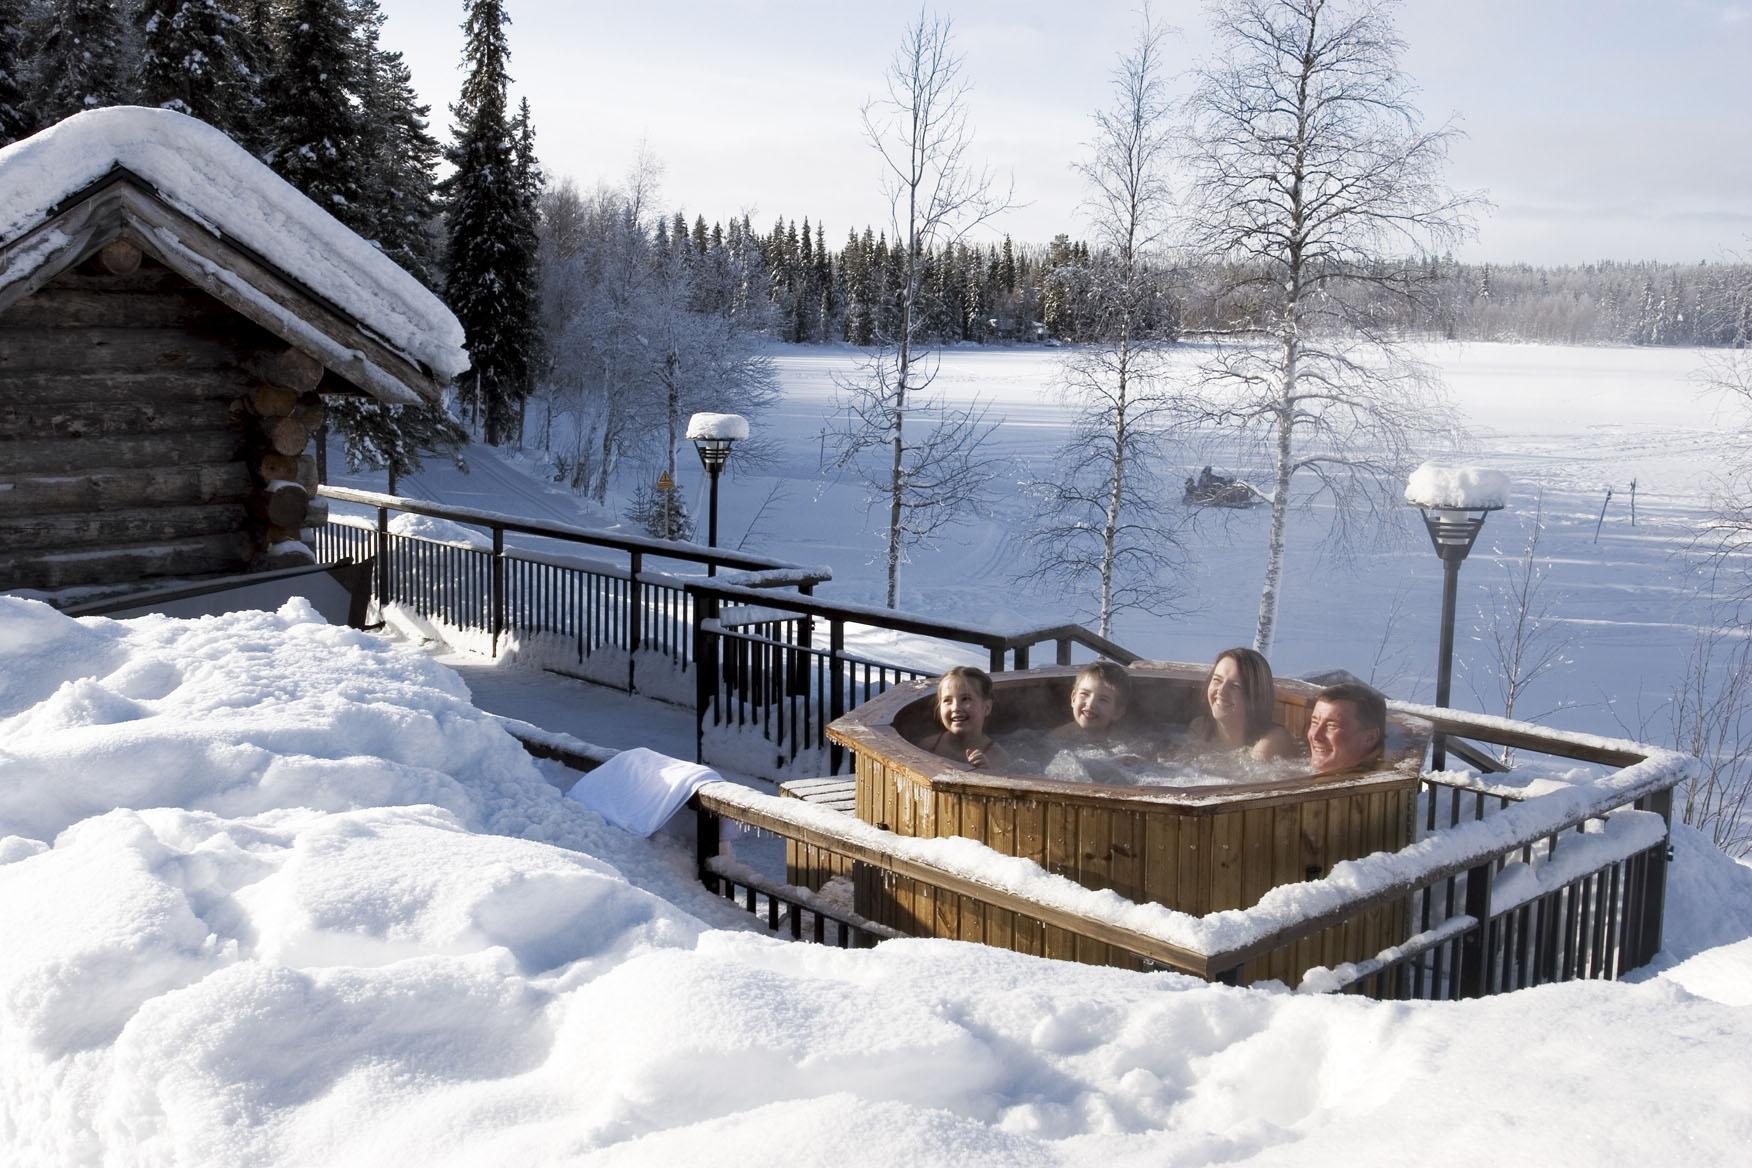 finnish sauna culture meets high tech ins news. Black Bedroom Furniture Sets. Home Design Ideas